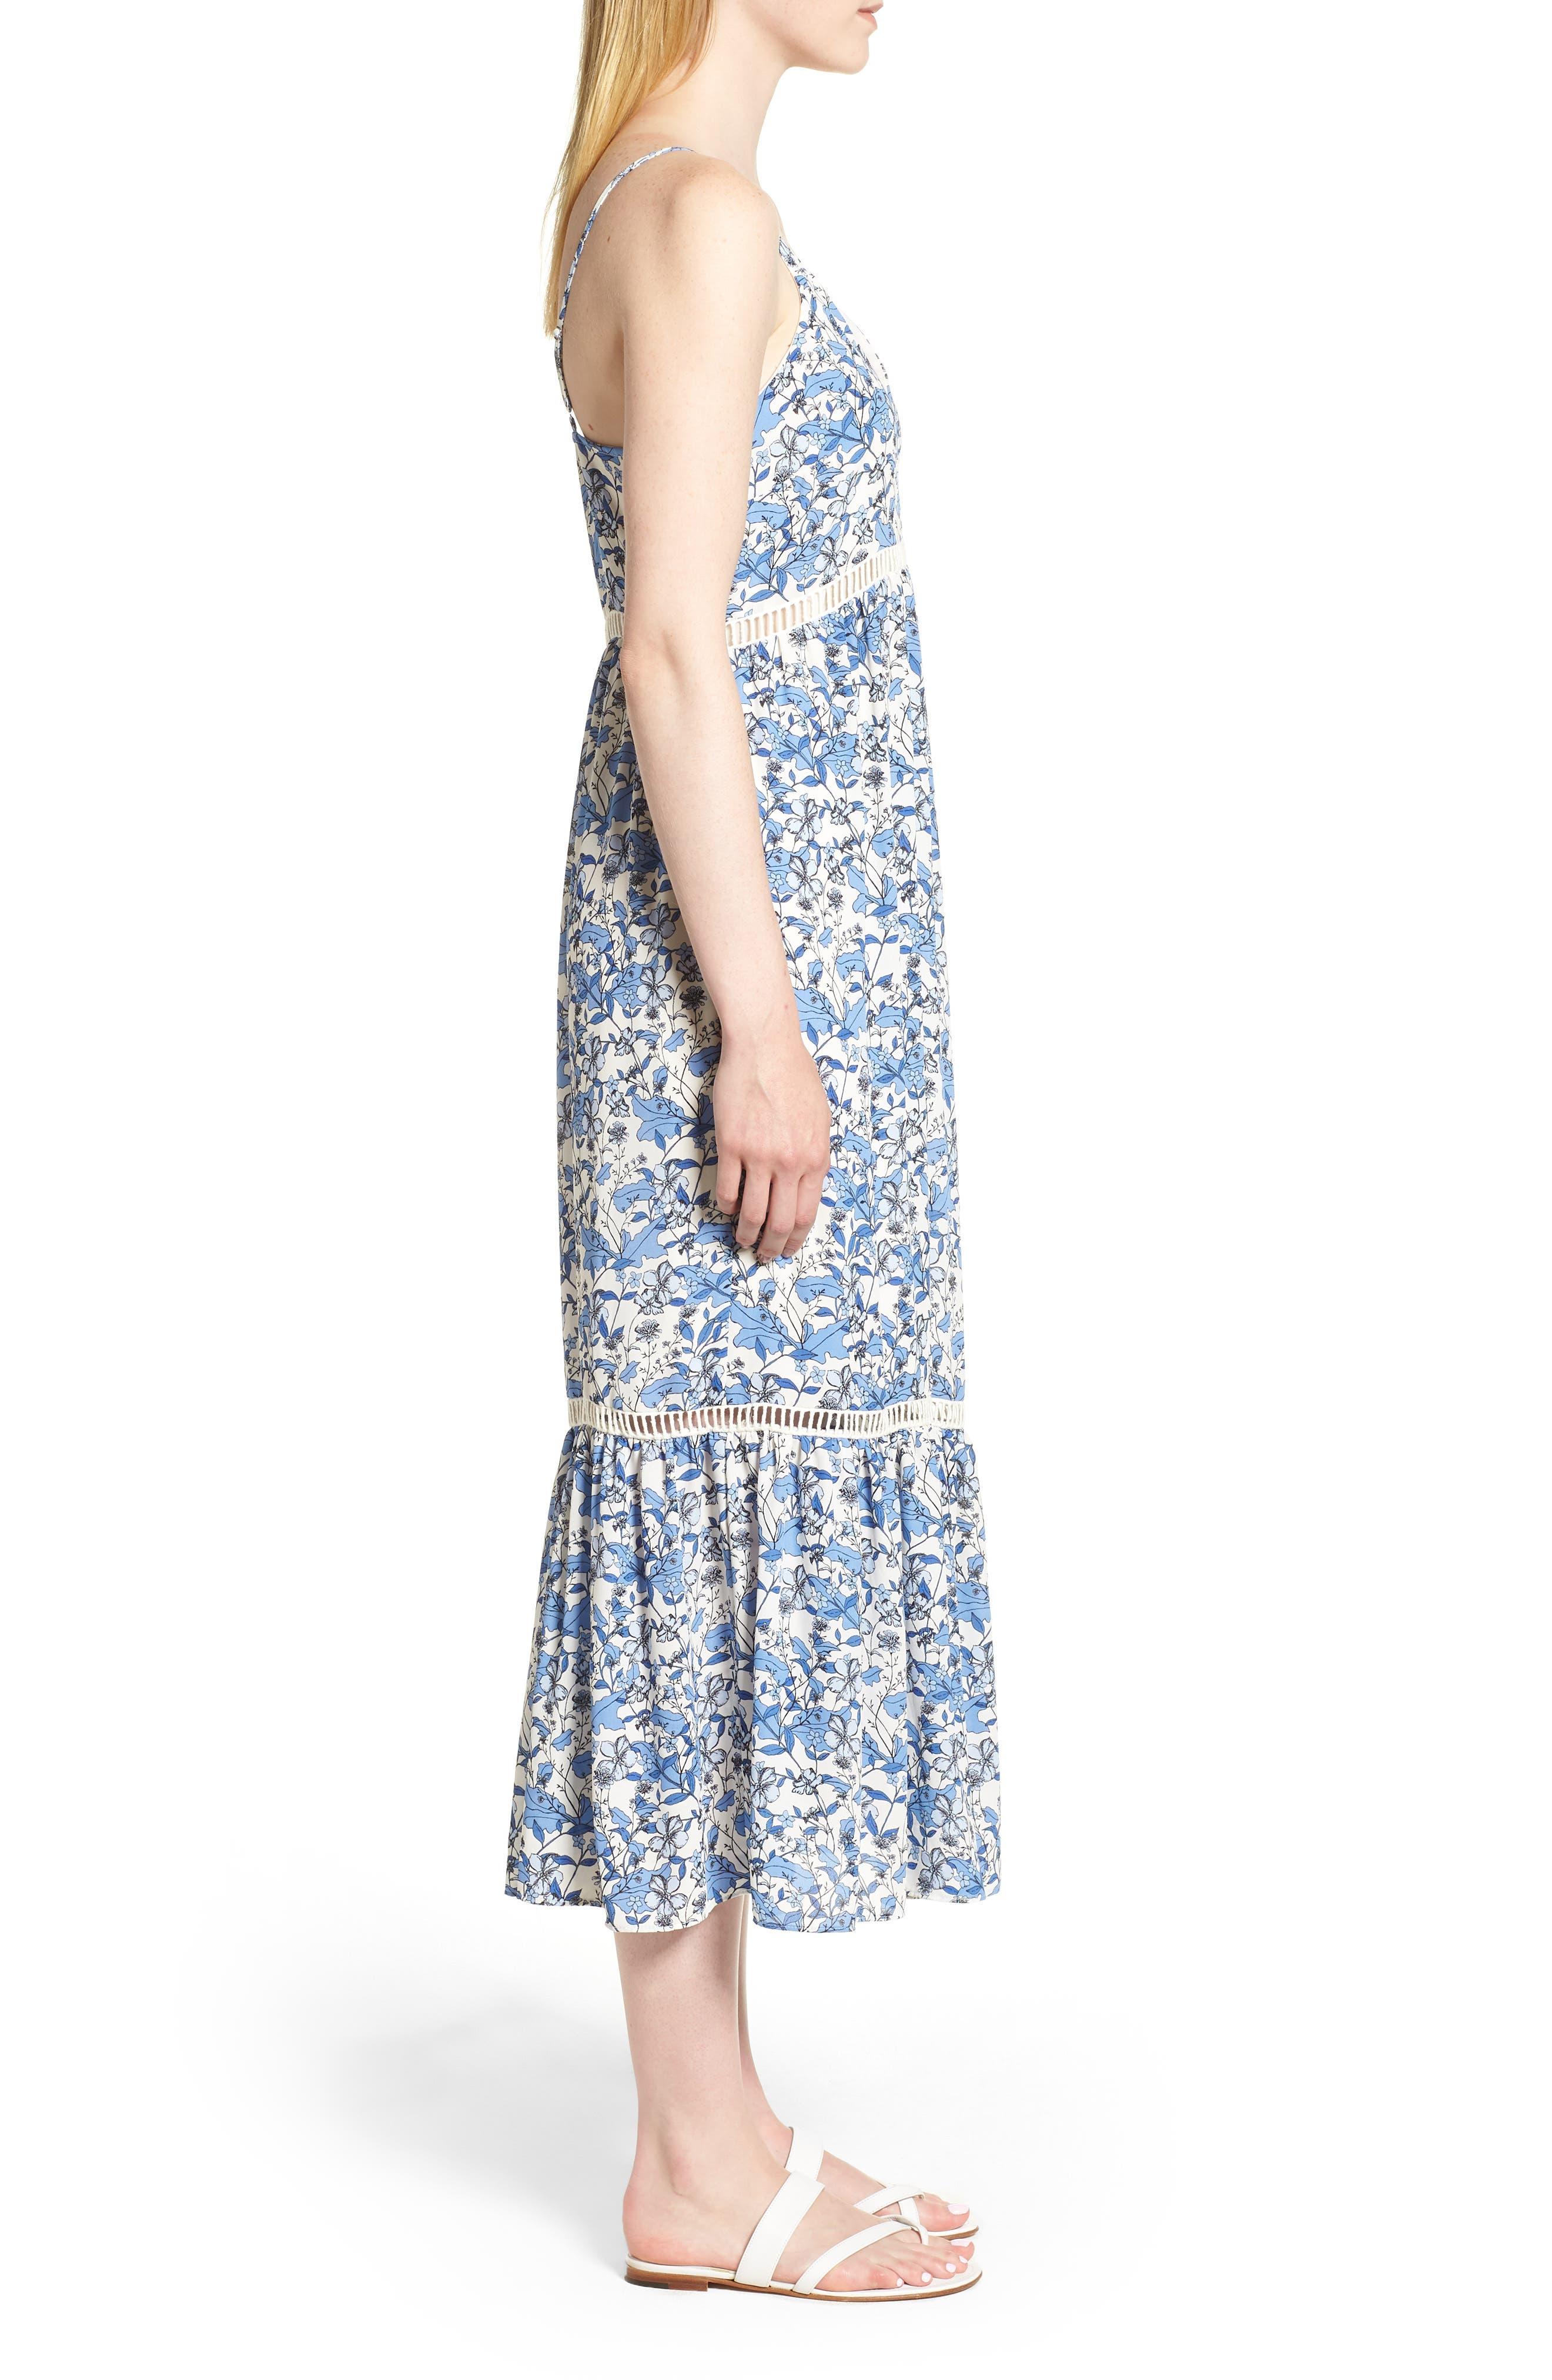 Ivy Forest Maxi Dress,                             Alternate thumbnail 3, color,                             Antique White